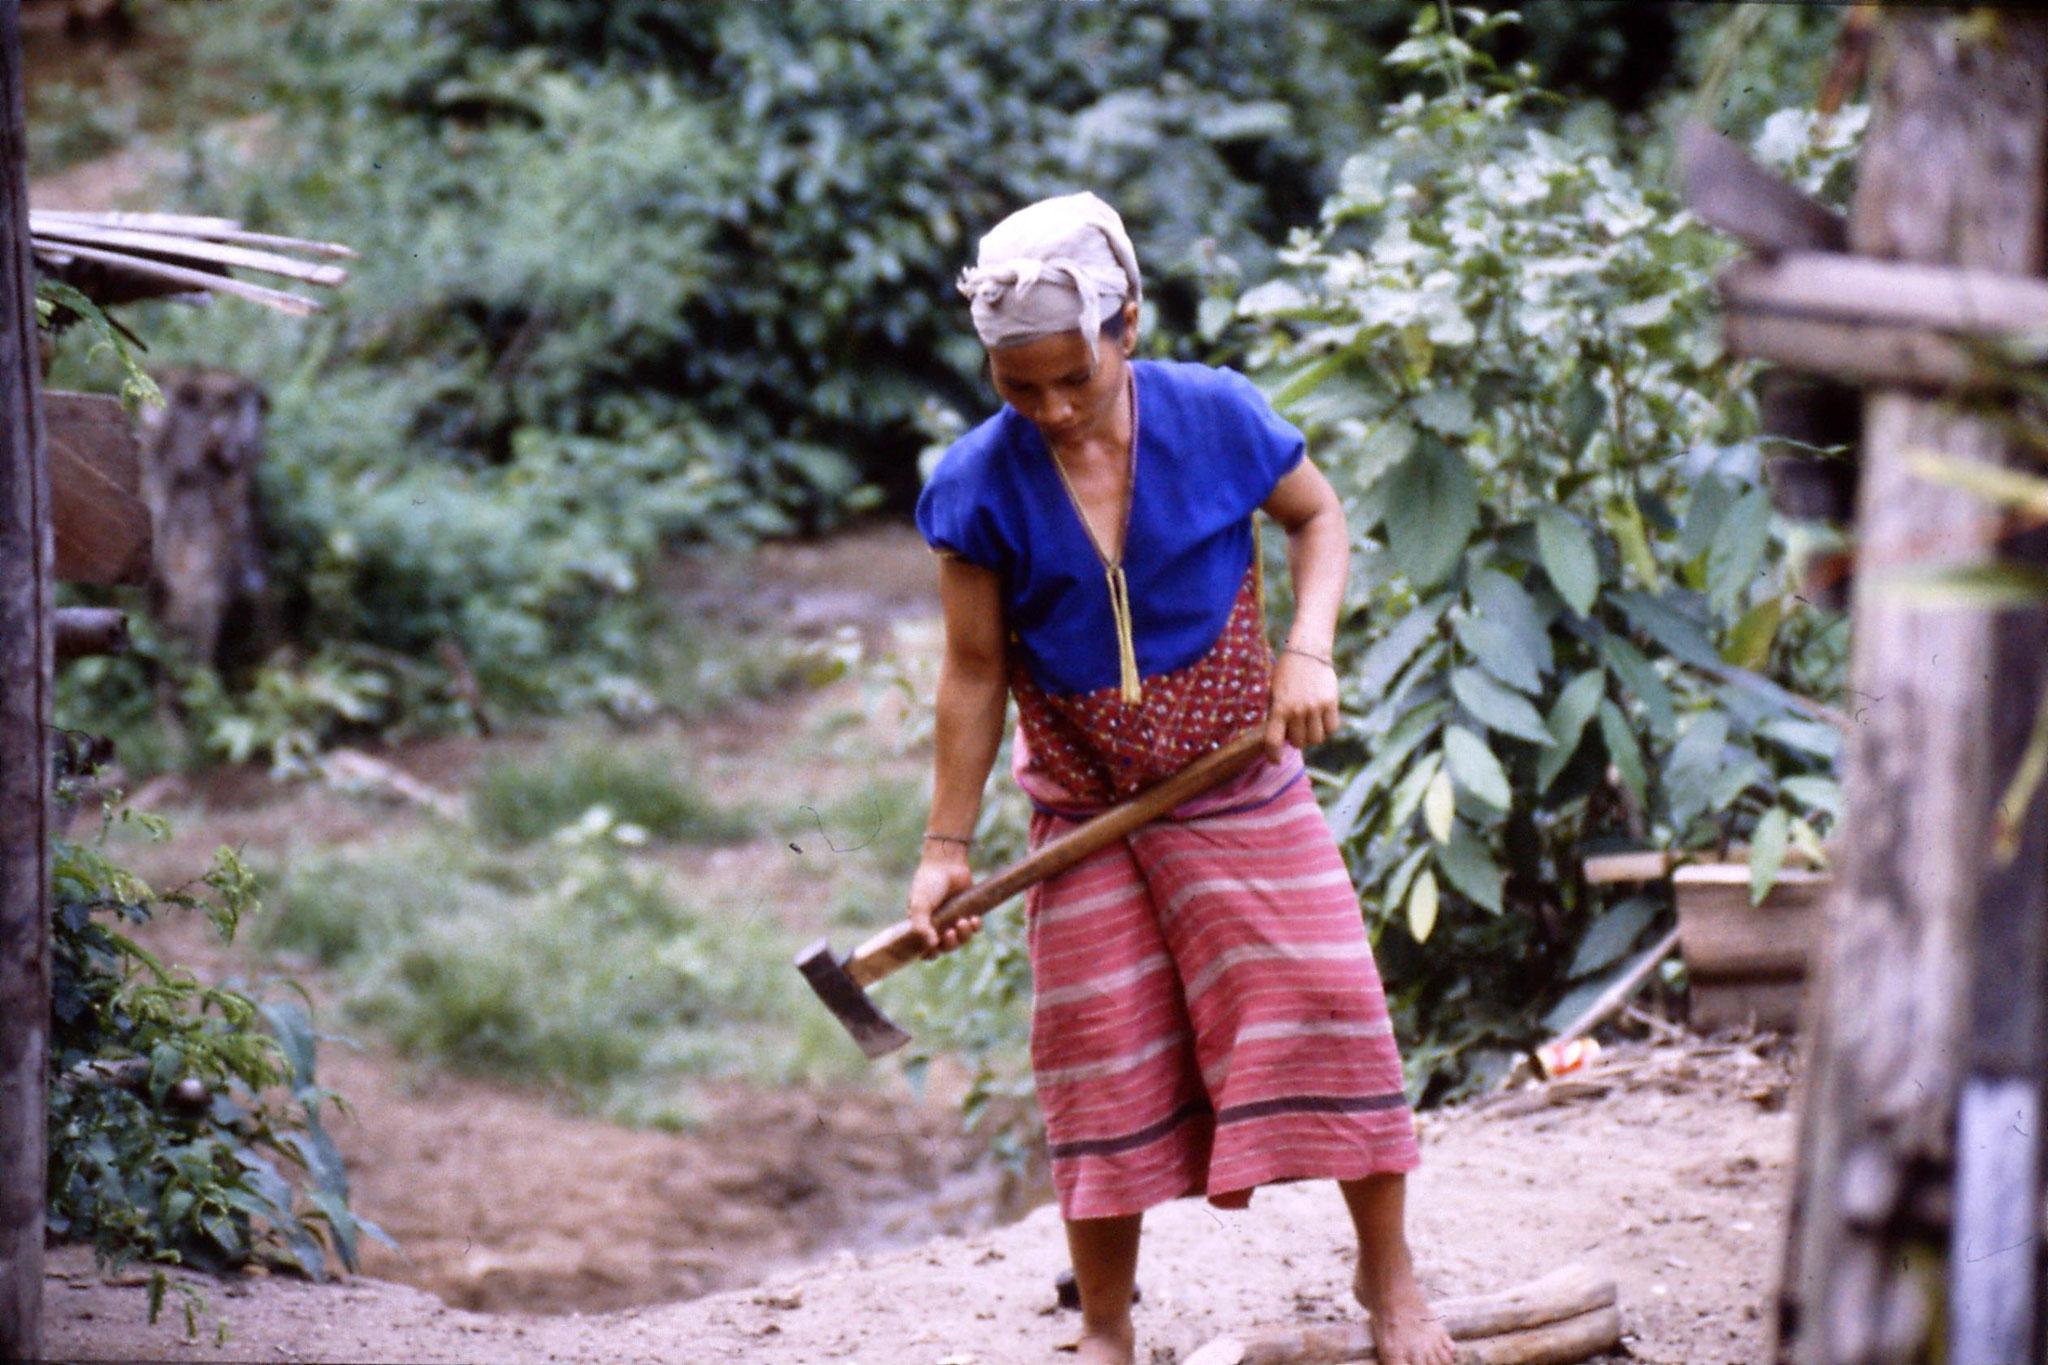 12/6/1990: 31: Trek - Hue Kom Karen village